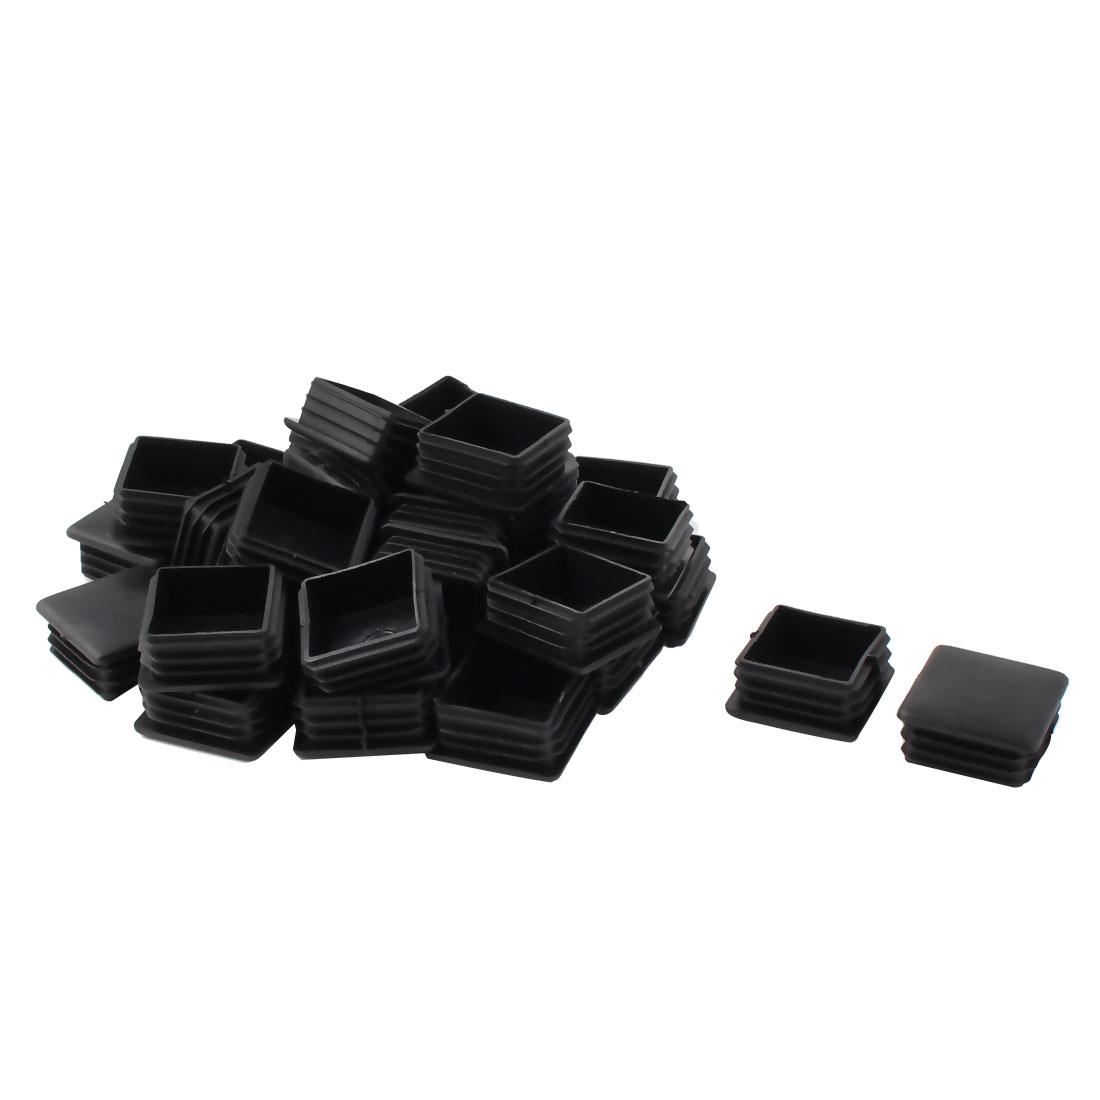 Furniture Chair Table Plastic Square Tube Insert End Cap Black 40mm x 40mm 30pcs